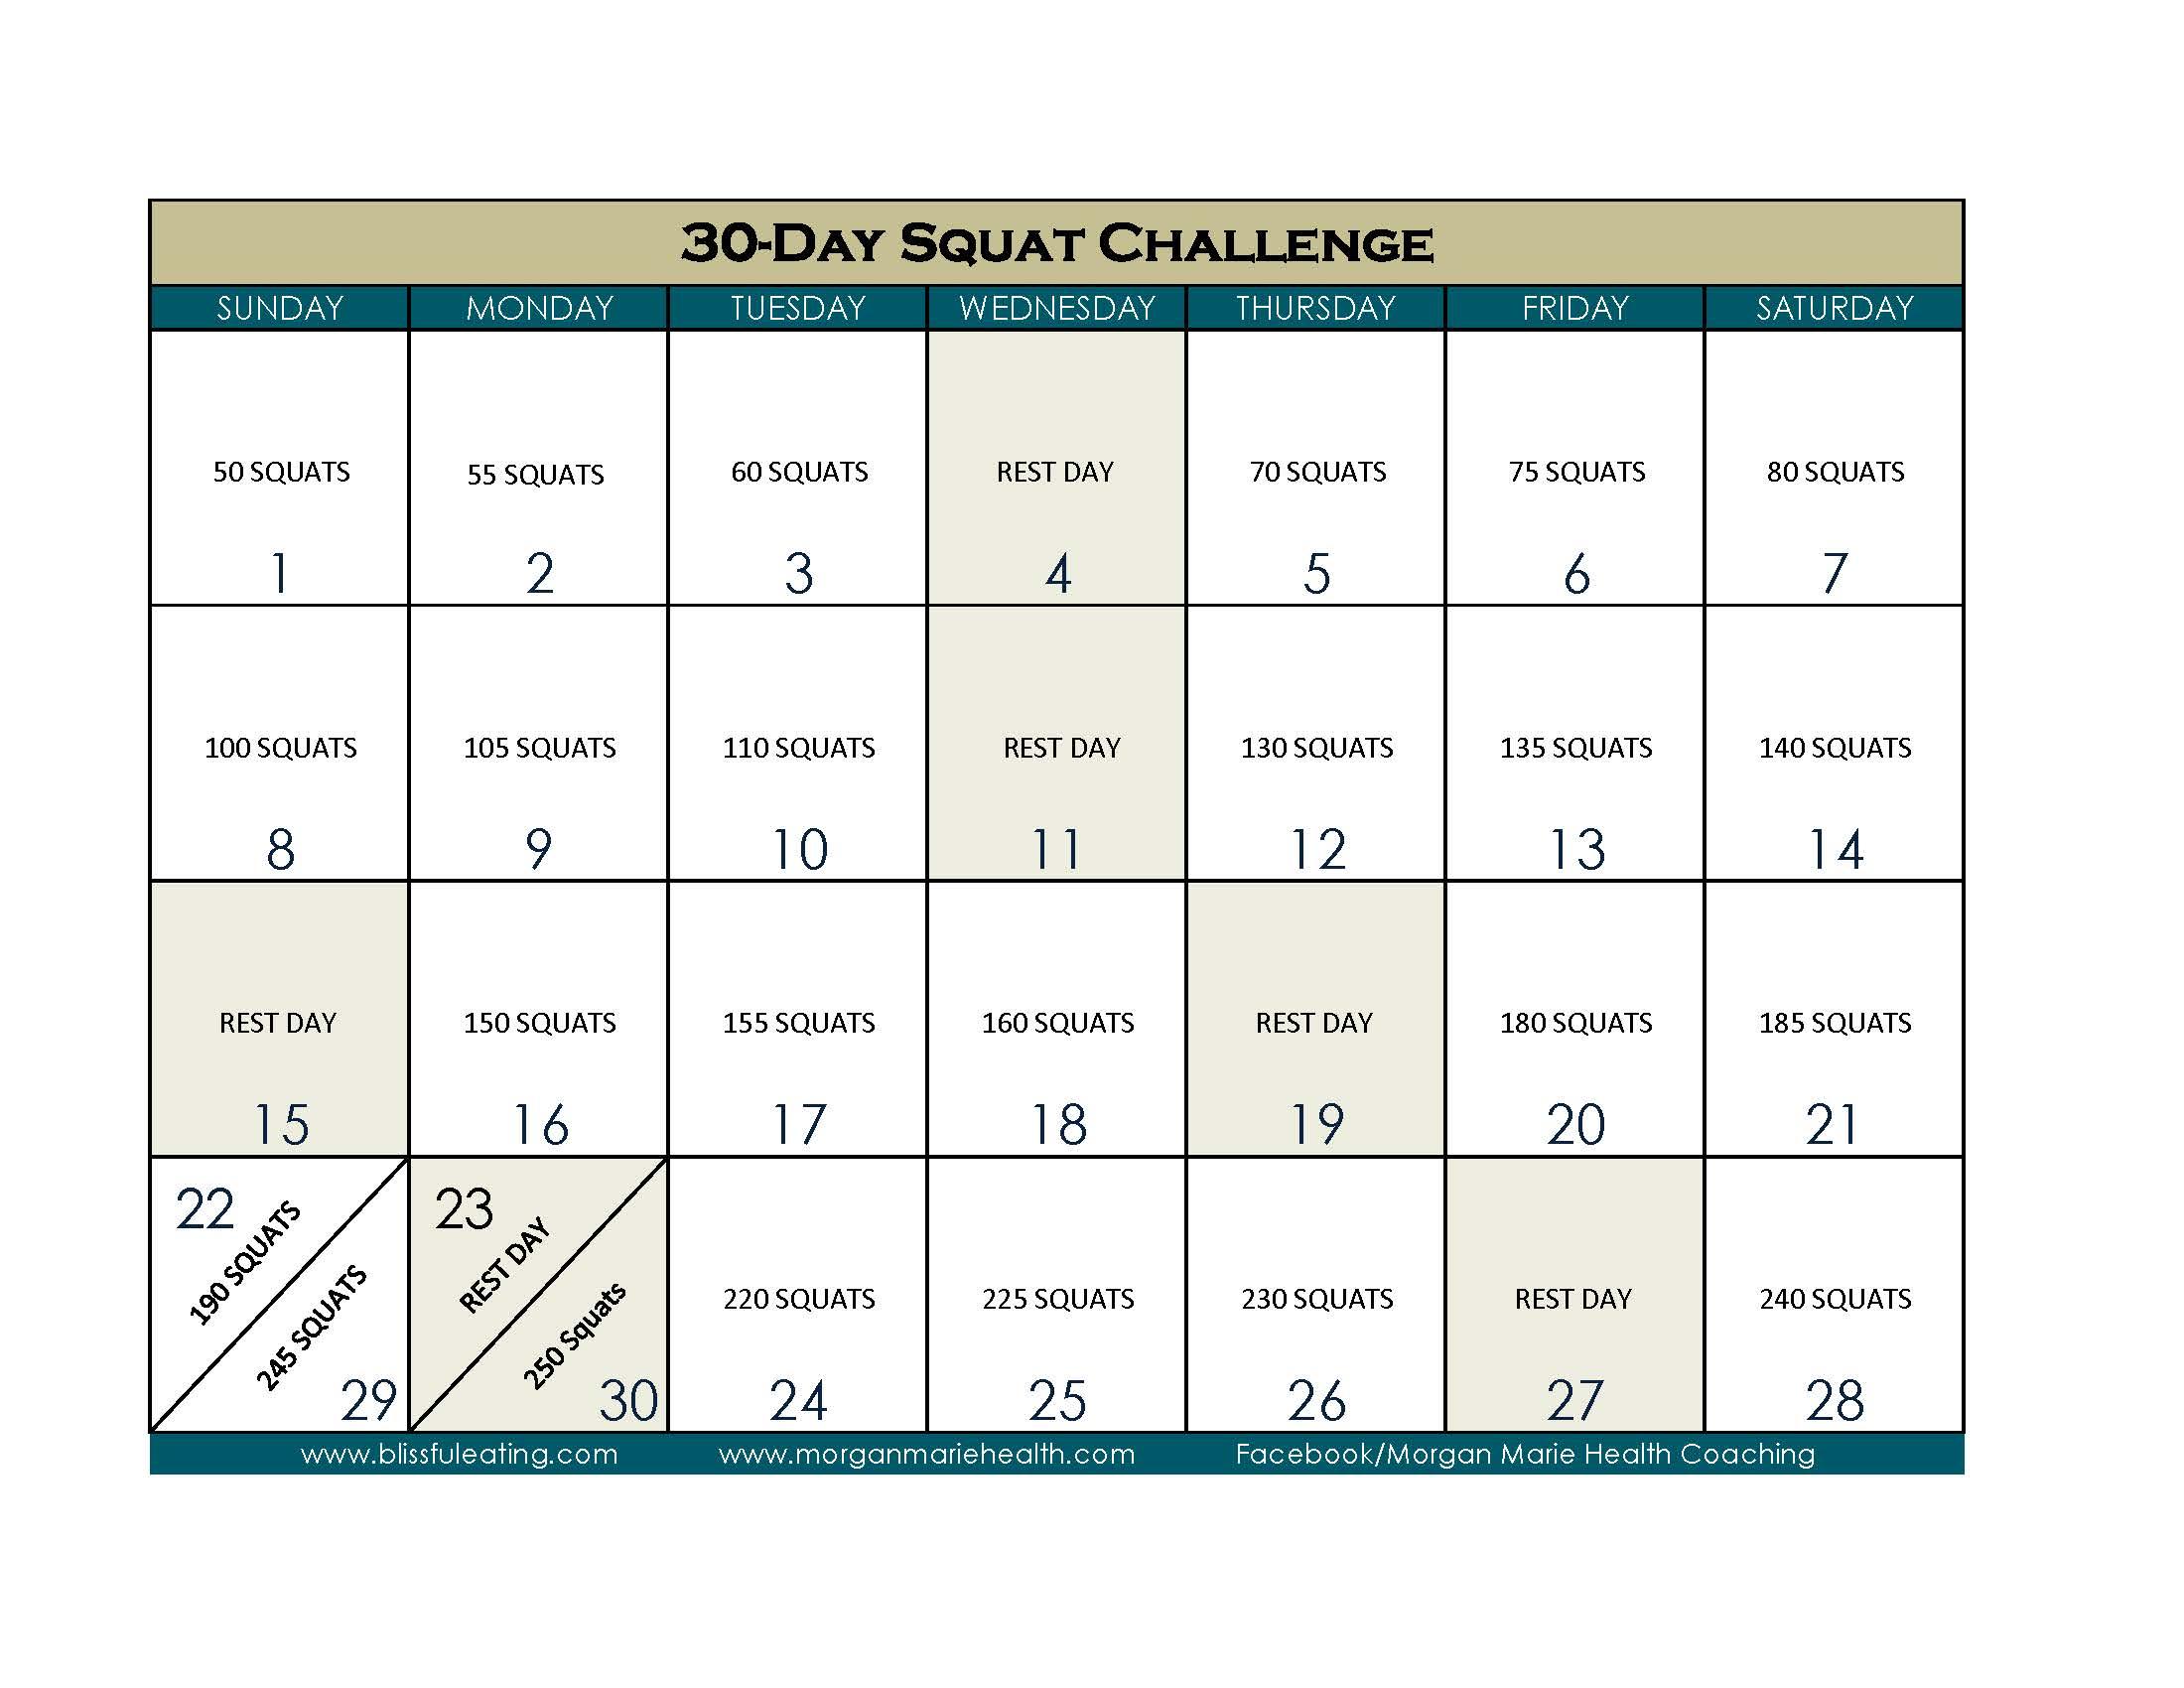 30 Day Squat Challenge Calendar Print Out Intended For 30 Days Squat Challenge Calendar